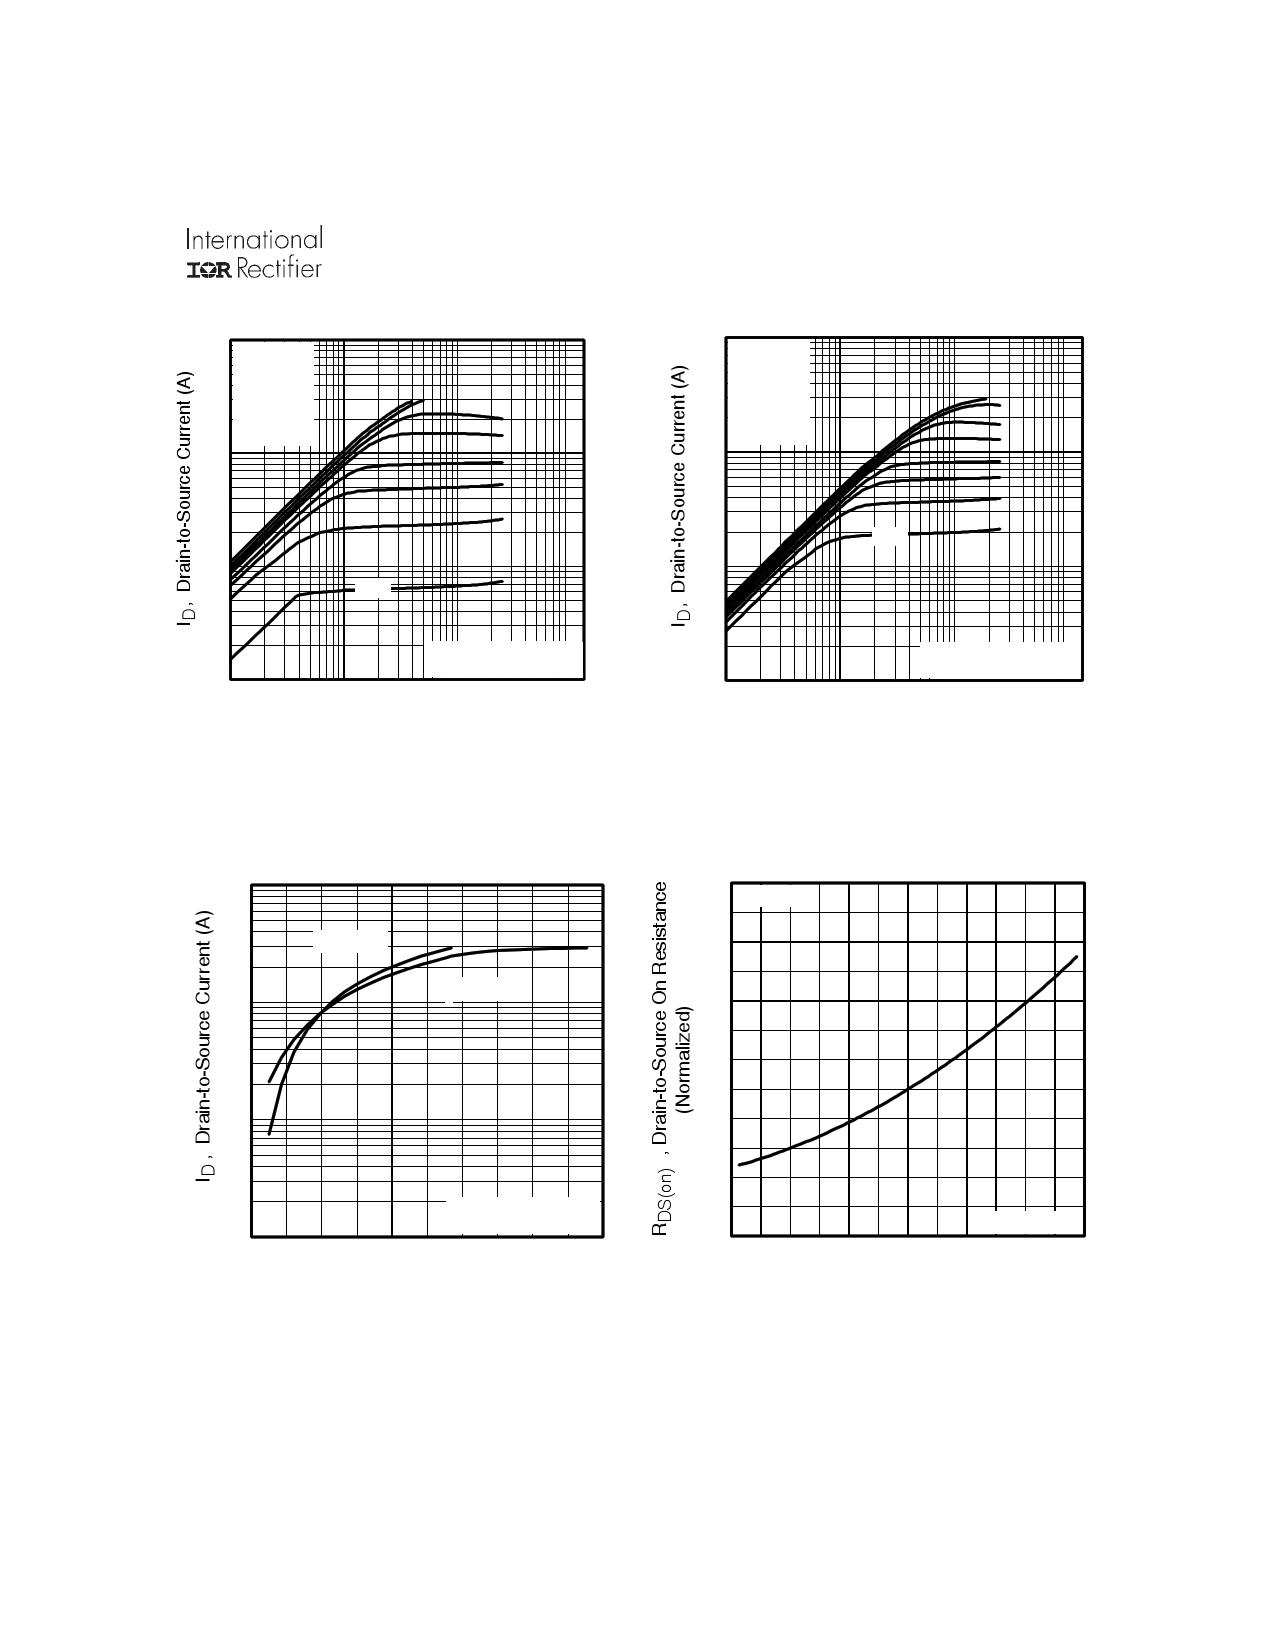 IRFZ48VPBF pdf, ピン配列